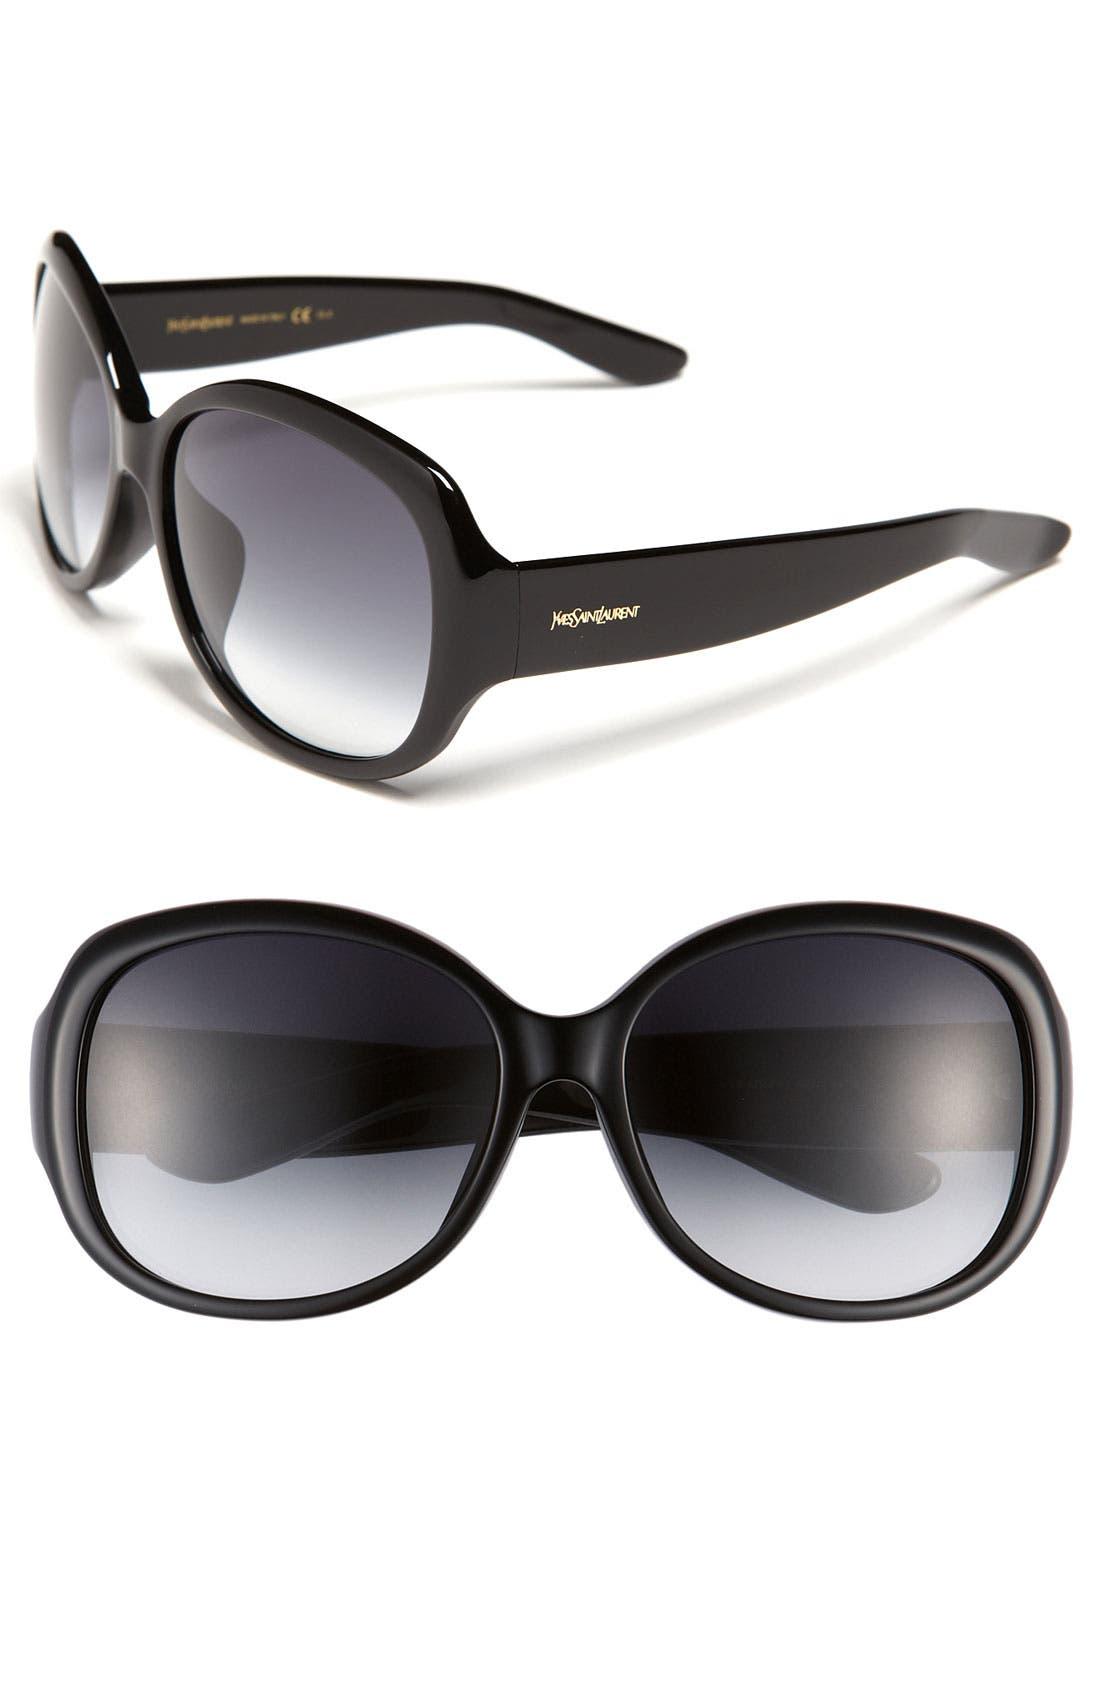 Main Image - Yves Saint Laurent Special Fit Sunglasses